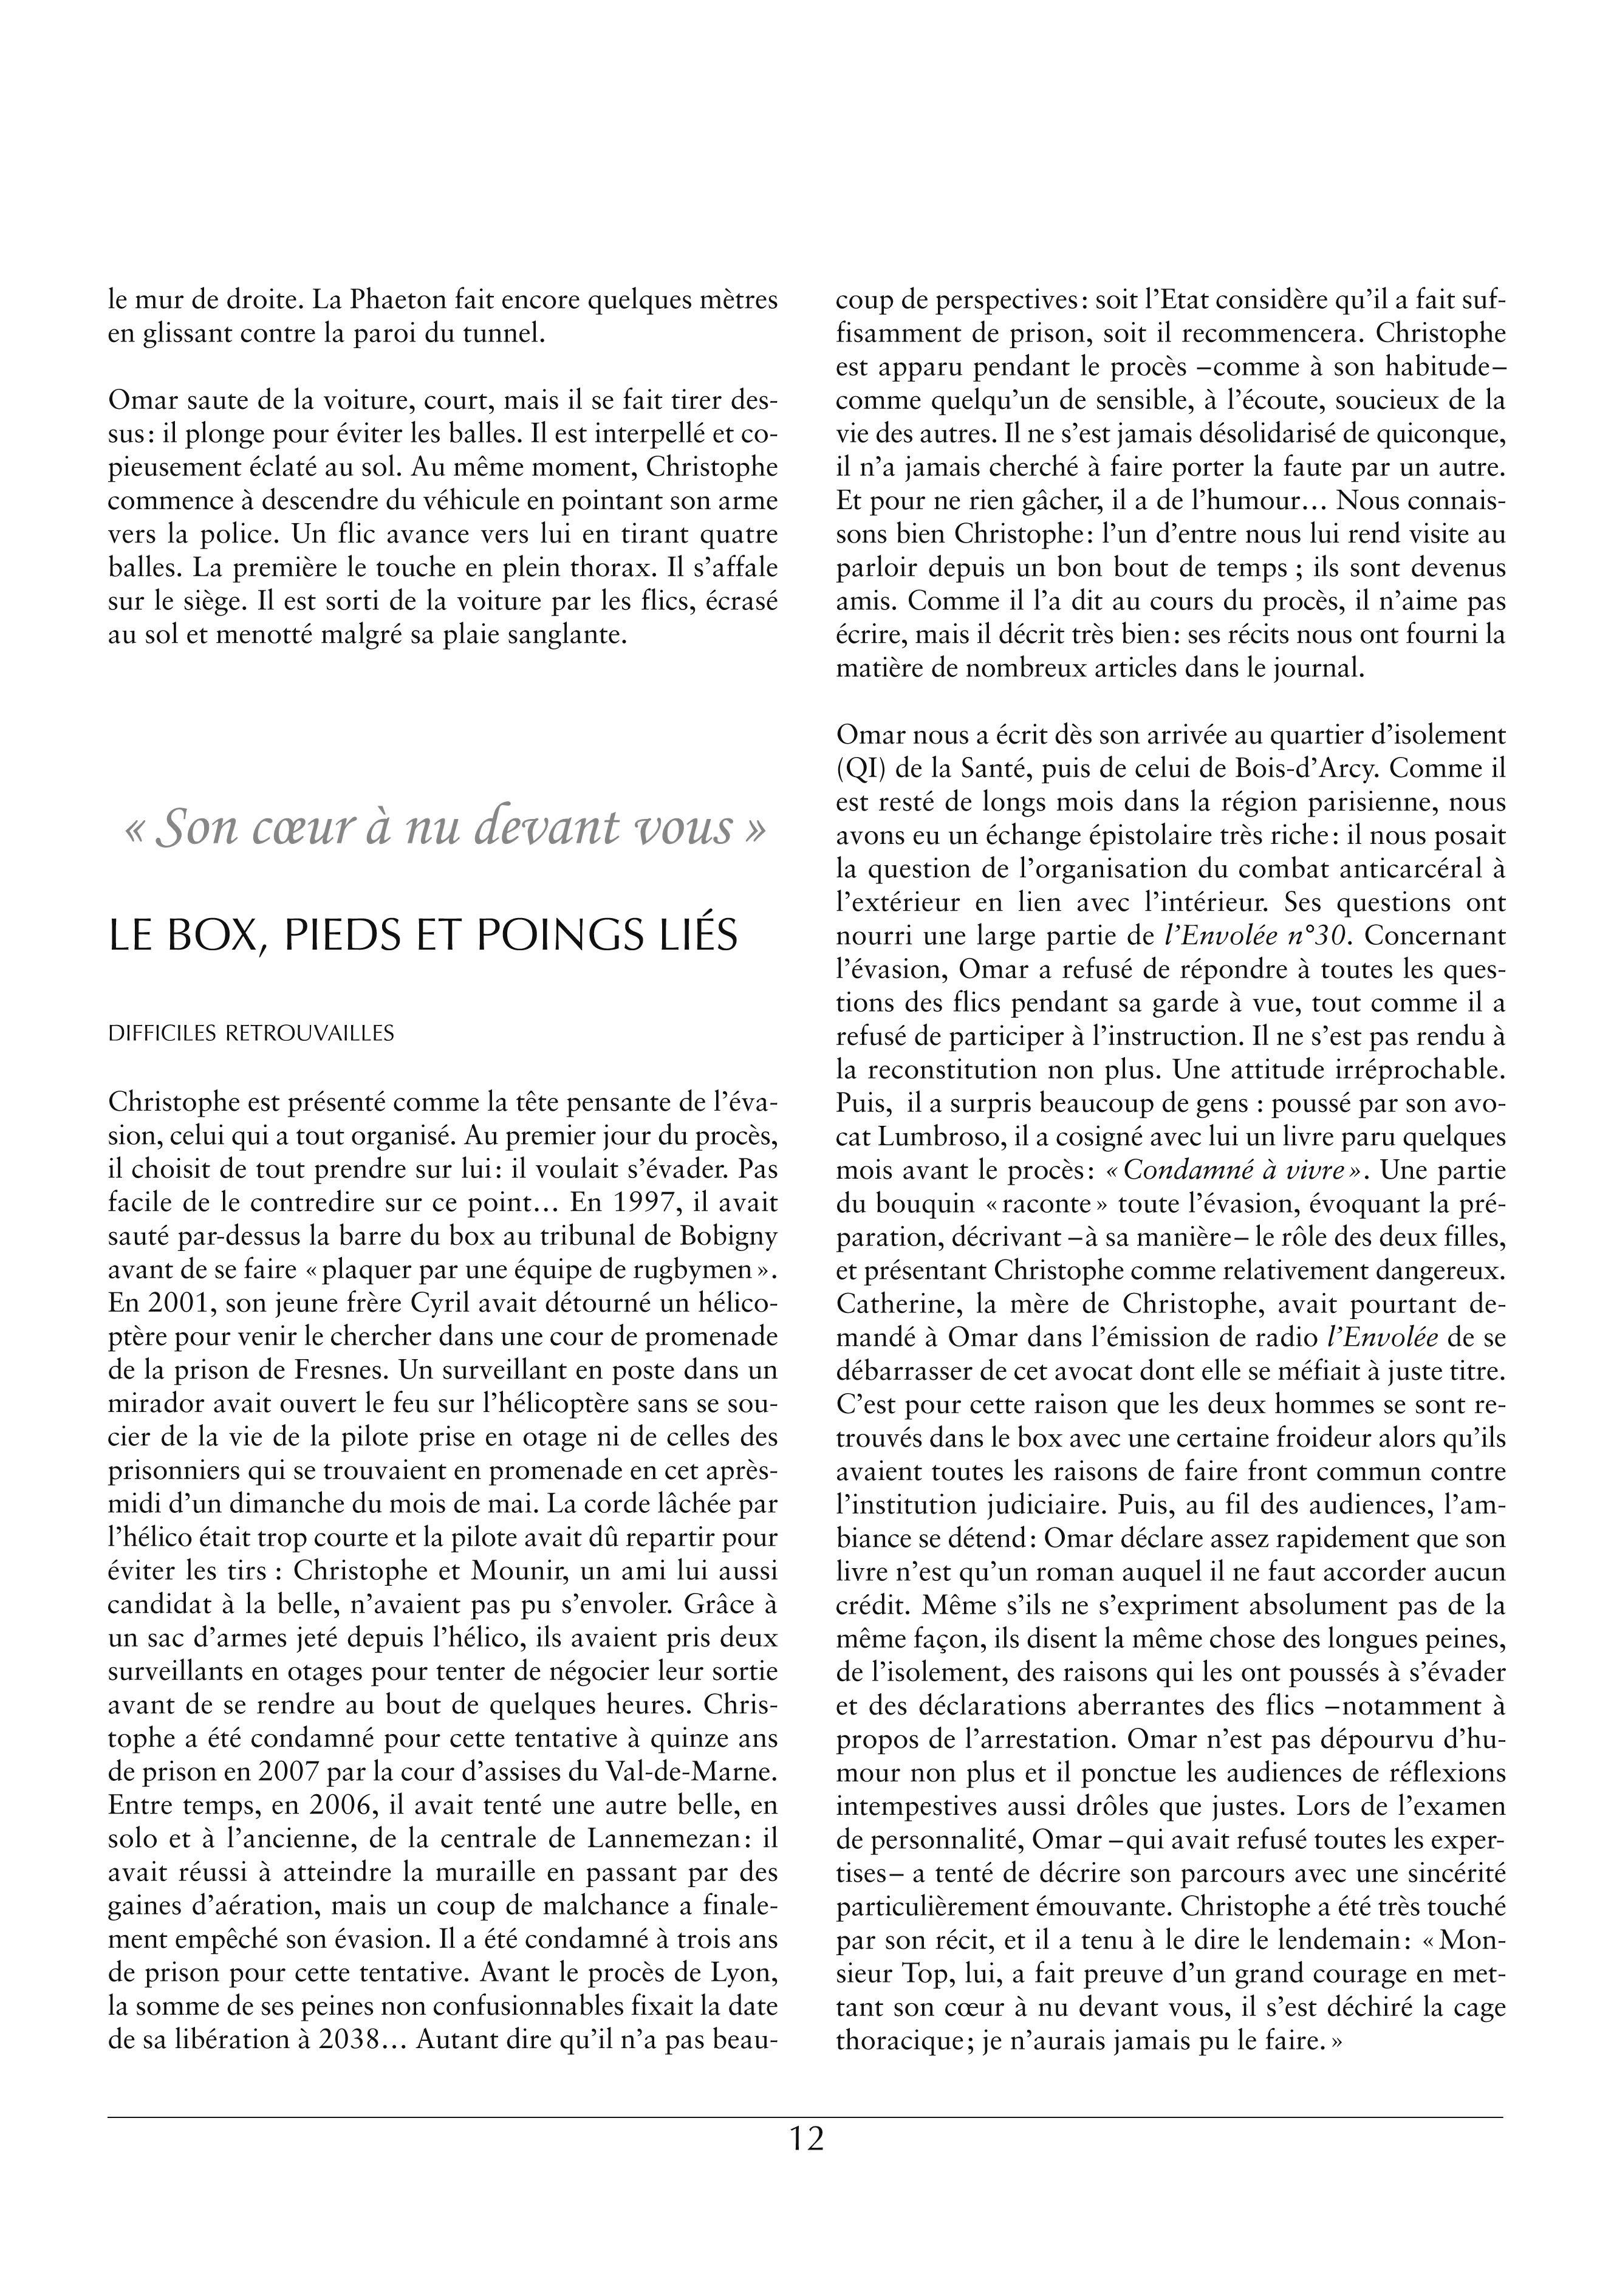 lenvolee_35 1_Page_12